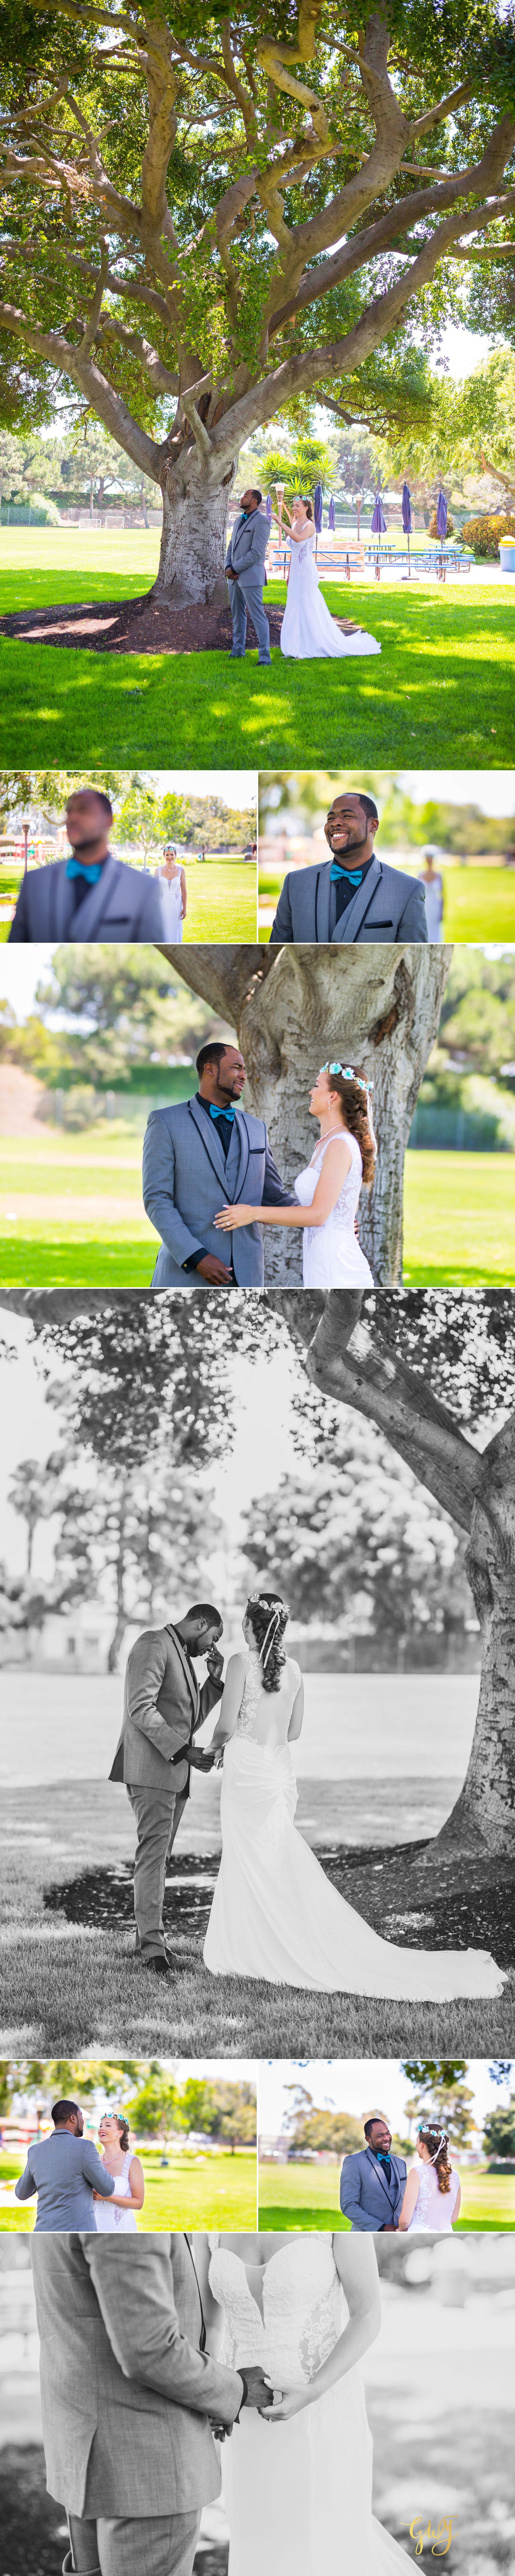 Rebecca + Torand El Segundo Chevron Employee Park Summer Barbados Bajan Wedding by Glass Woods Media 18.jpg